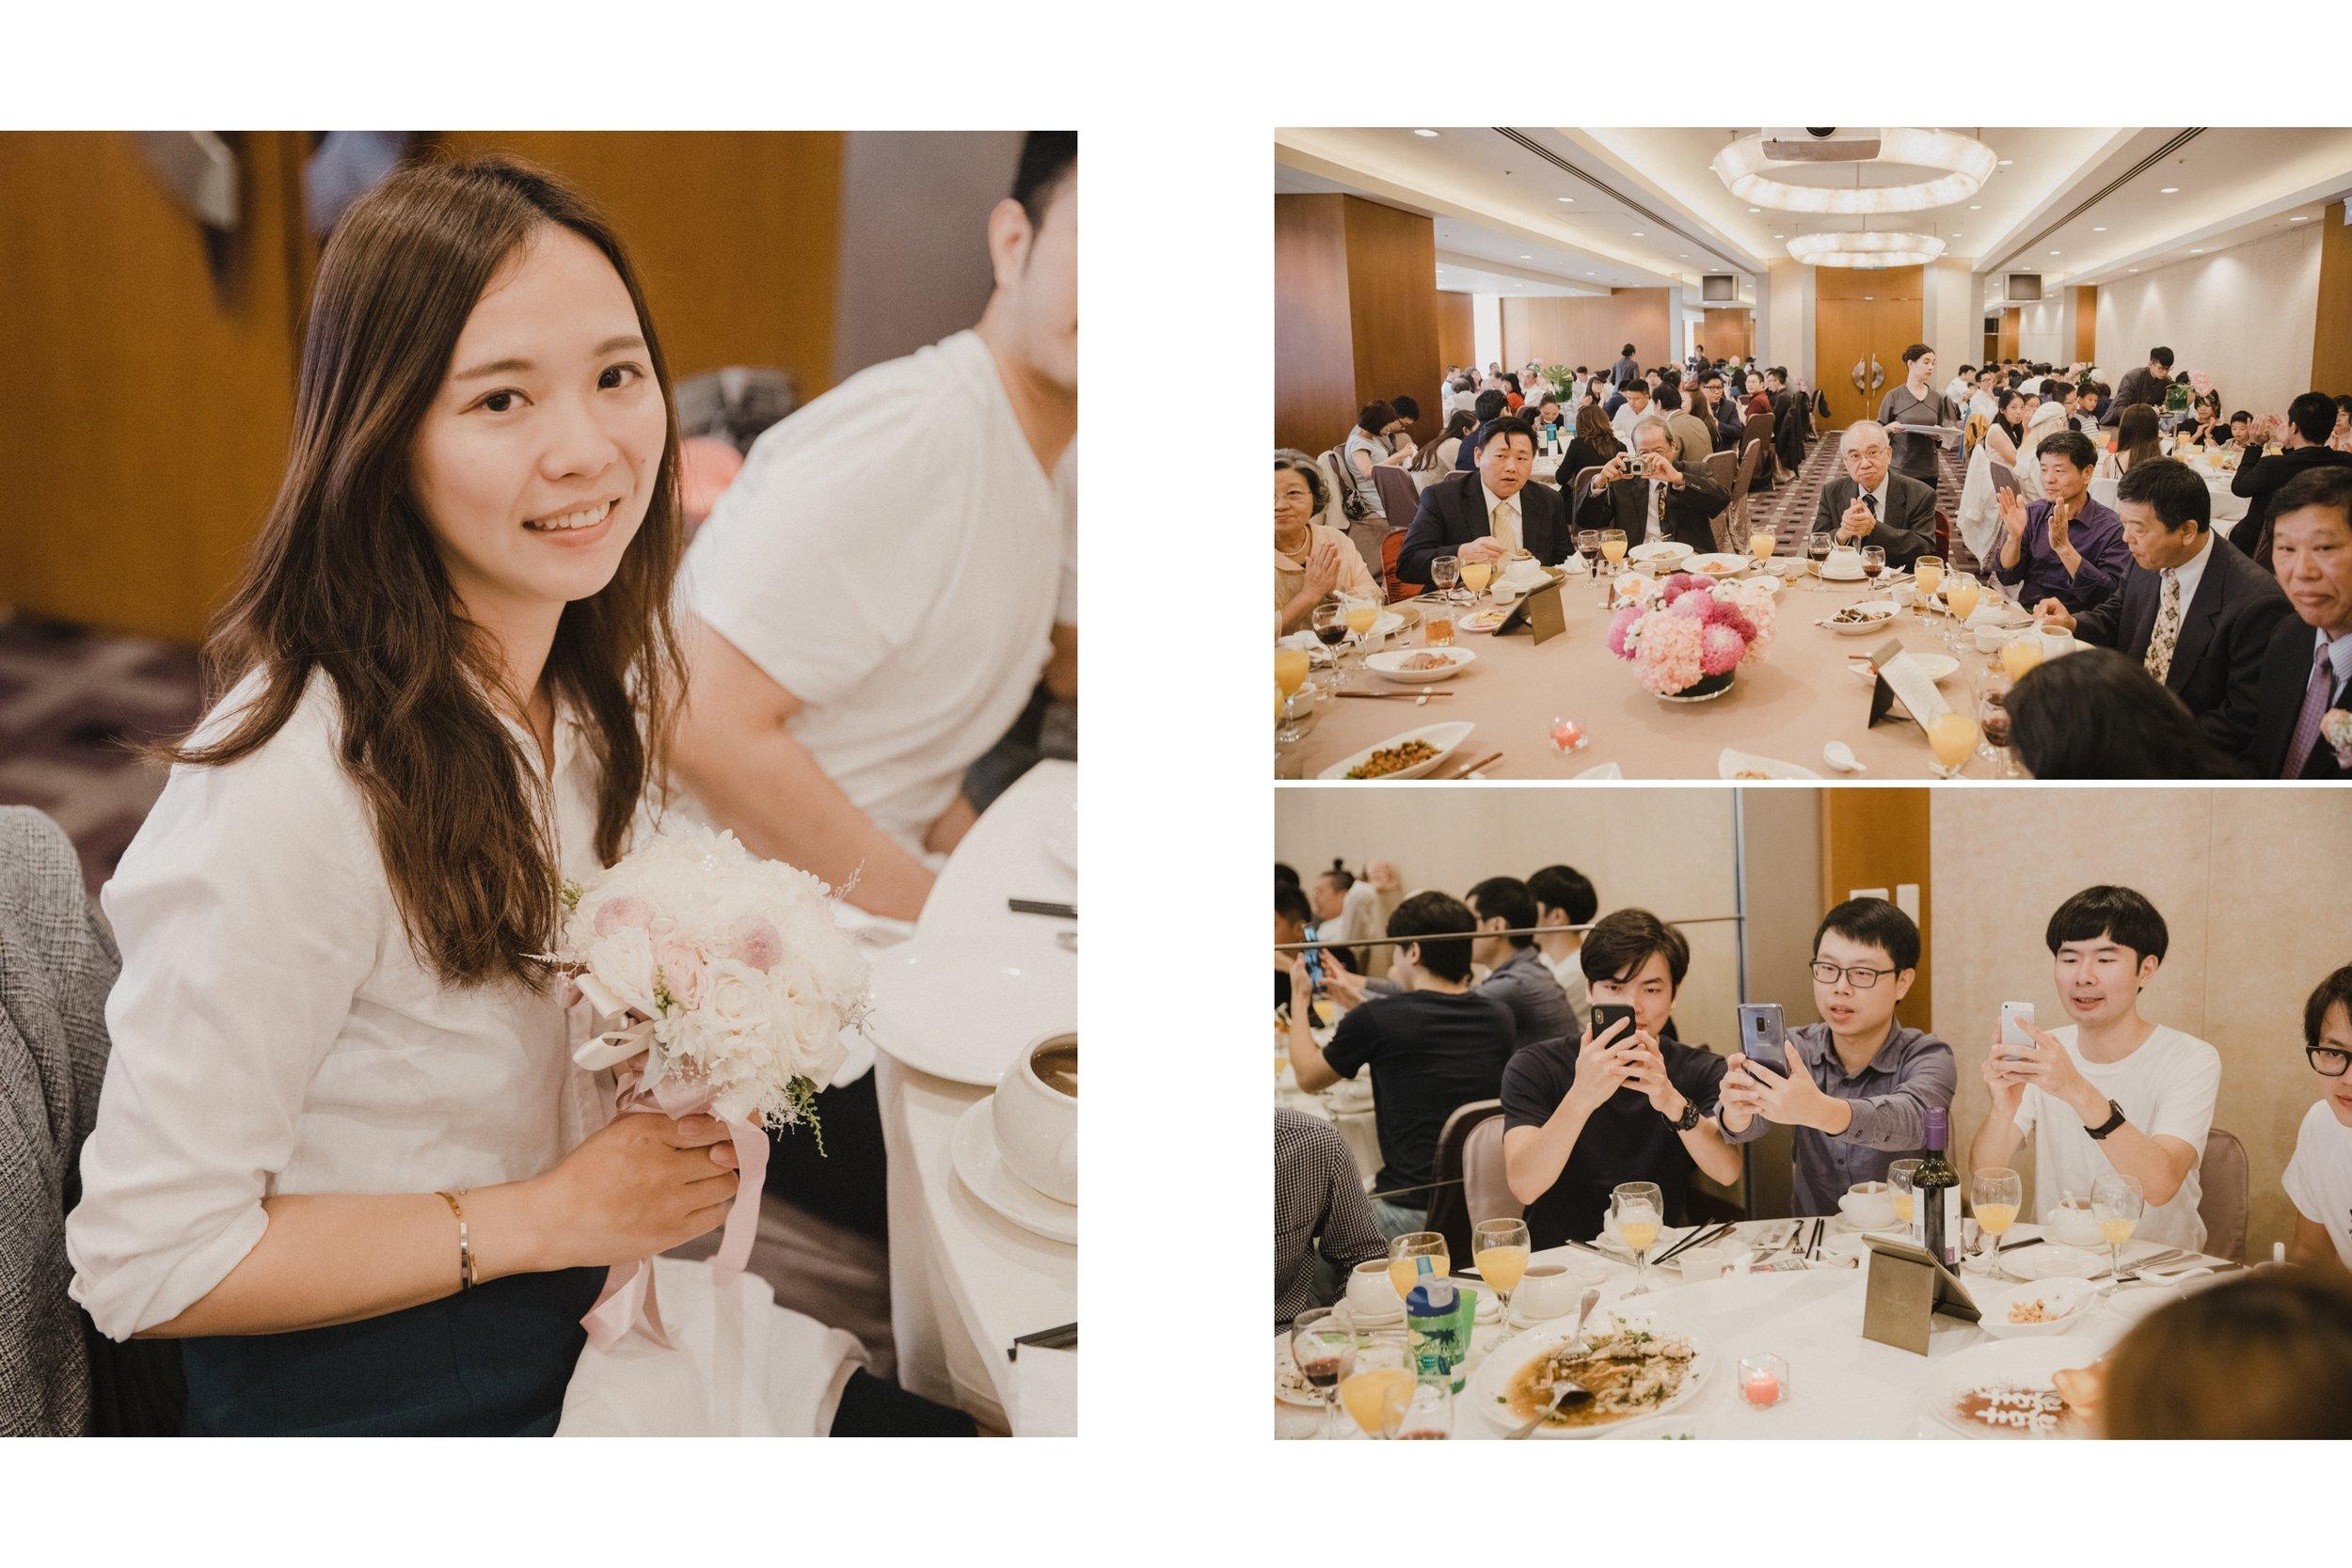 wedding-caridee-oscar-lunch-ambassador-hsinchu-結婚午宴-新竹國賓_117.jpg